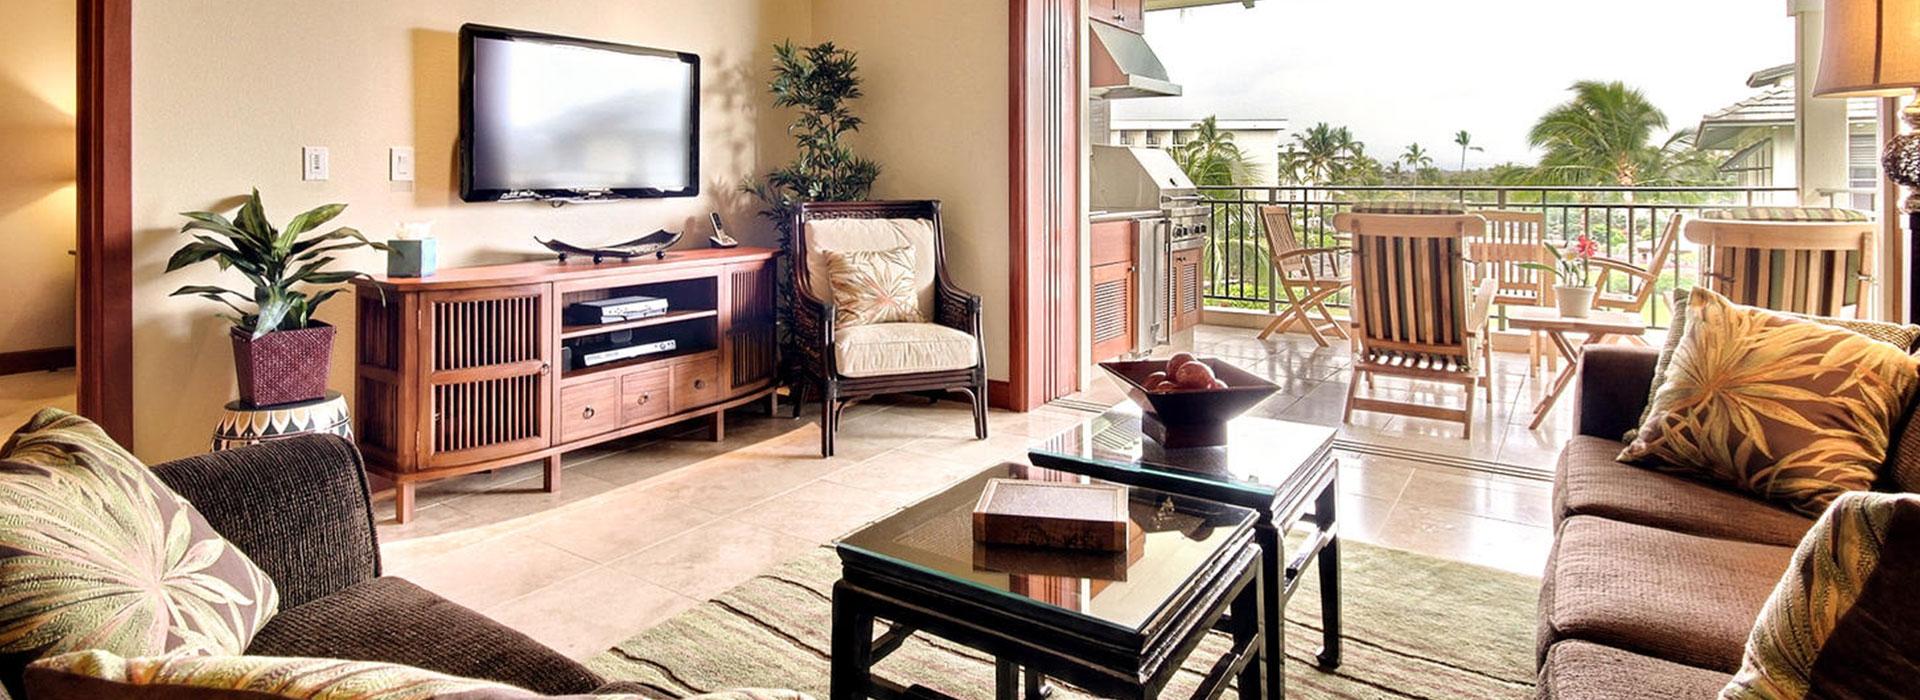 Waikoloa Condos | Waikoloa Beach & Mauna Lani Rentals | Kohala ...